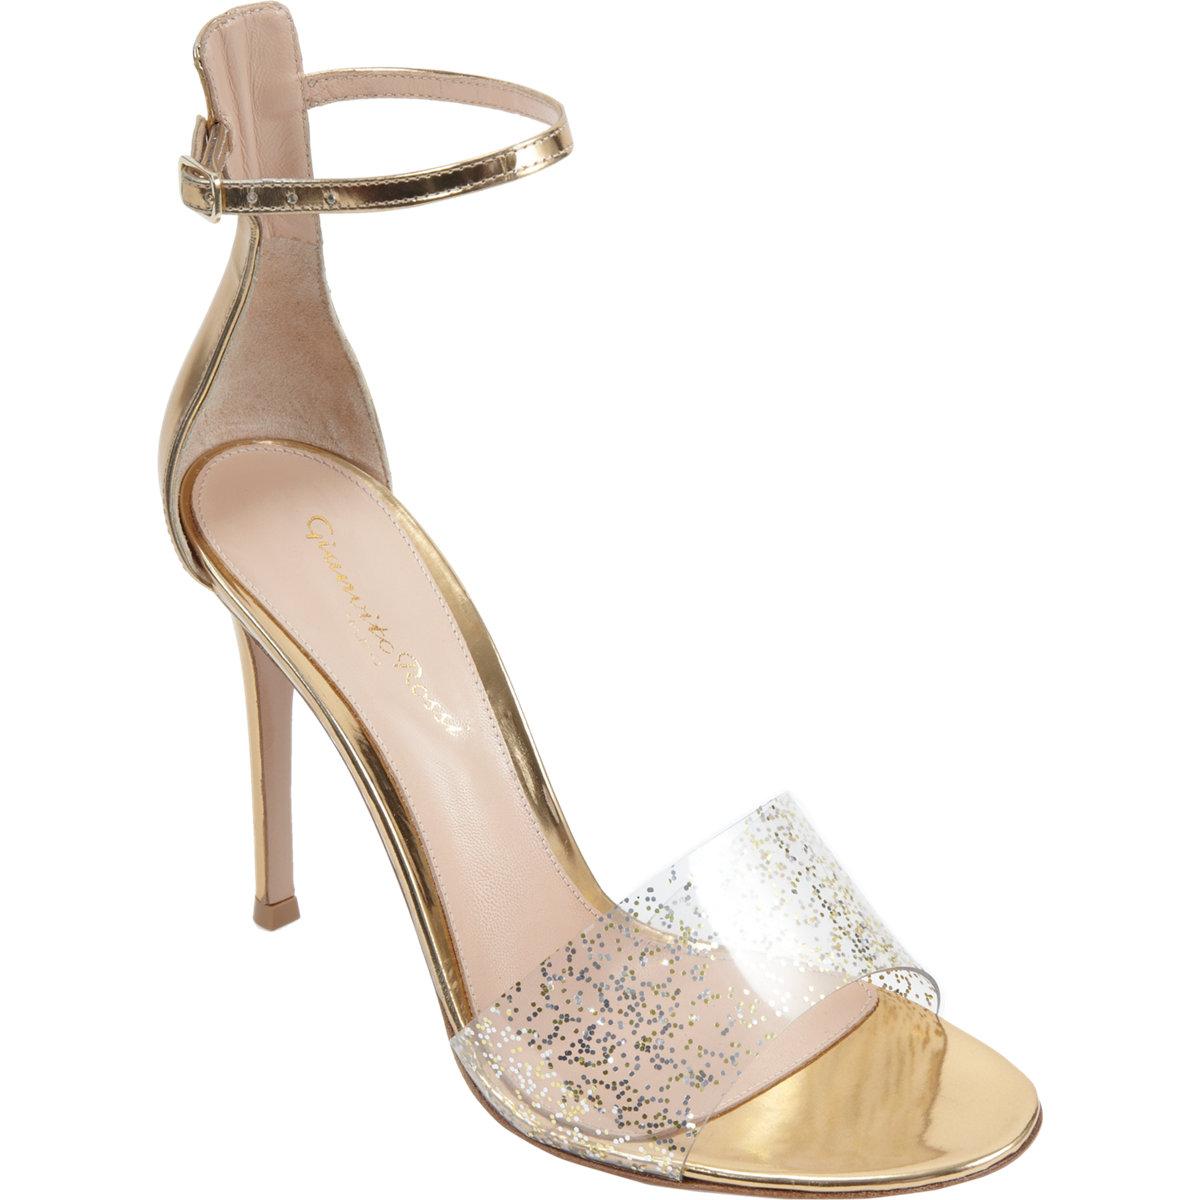 GIANVITO ROSSI Metallic Glitter Open Toe Sandal buy HERE